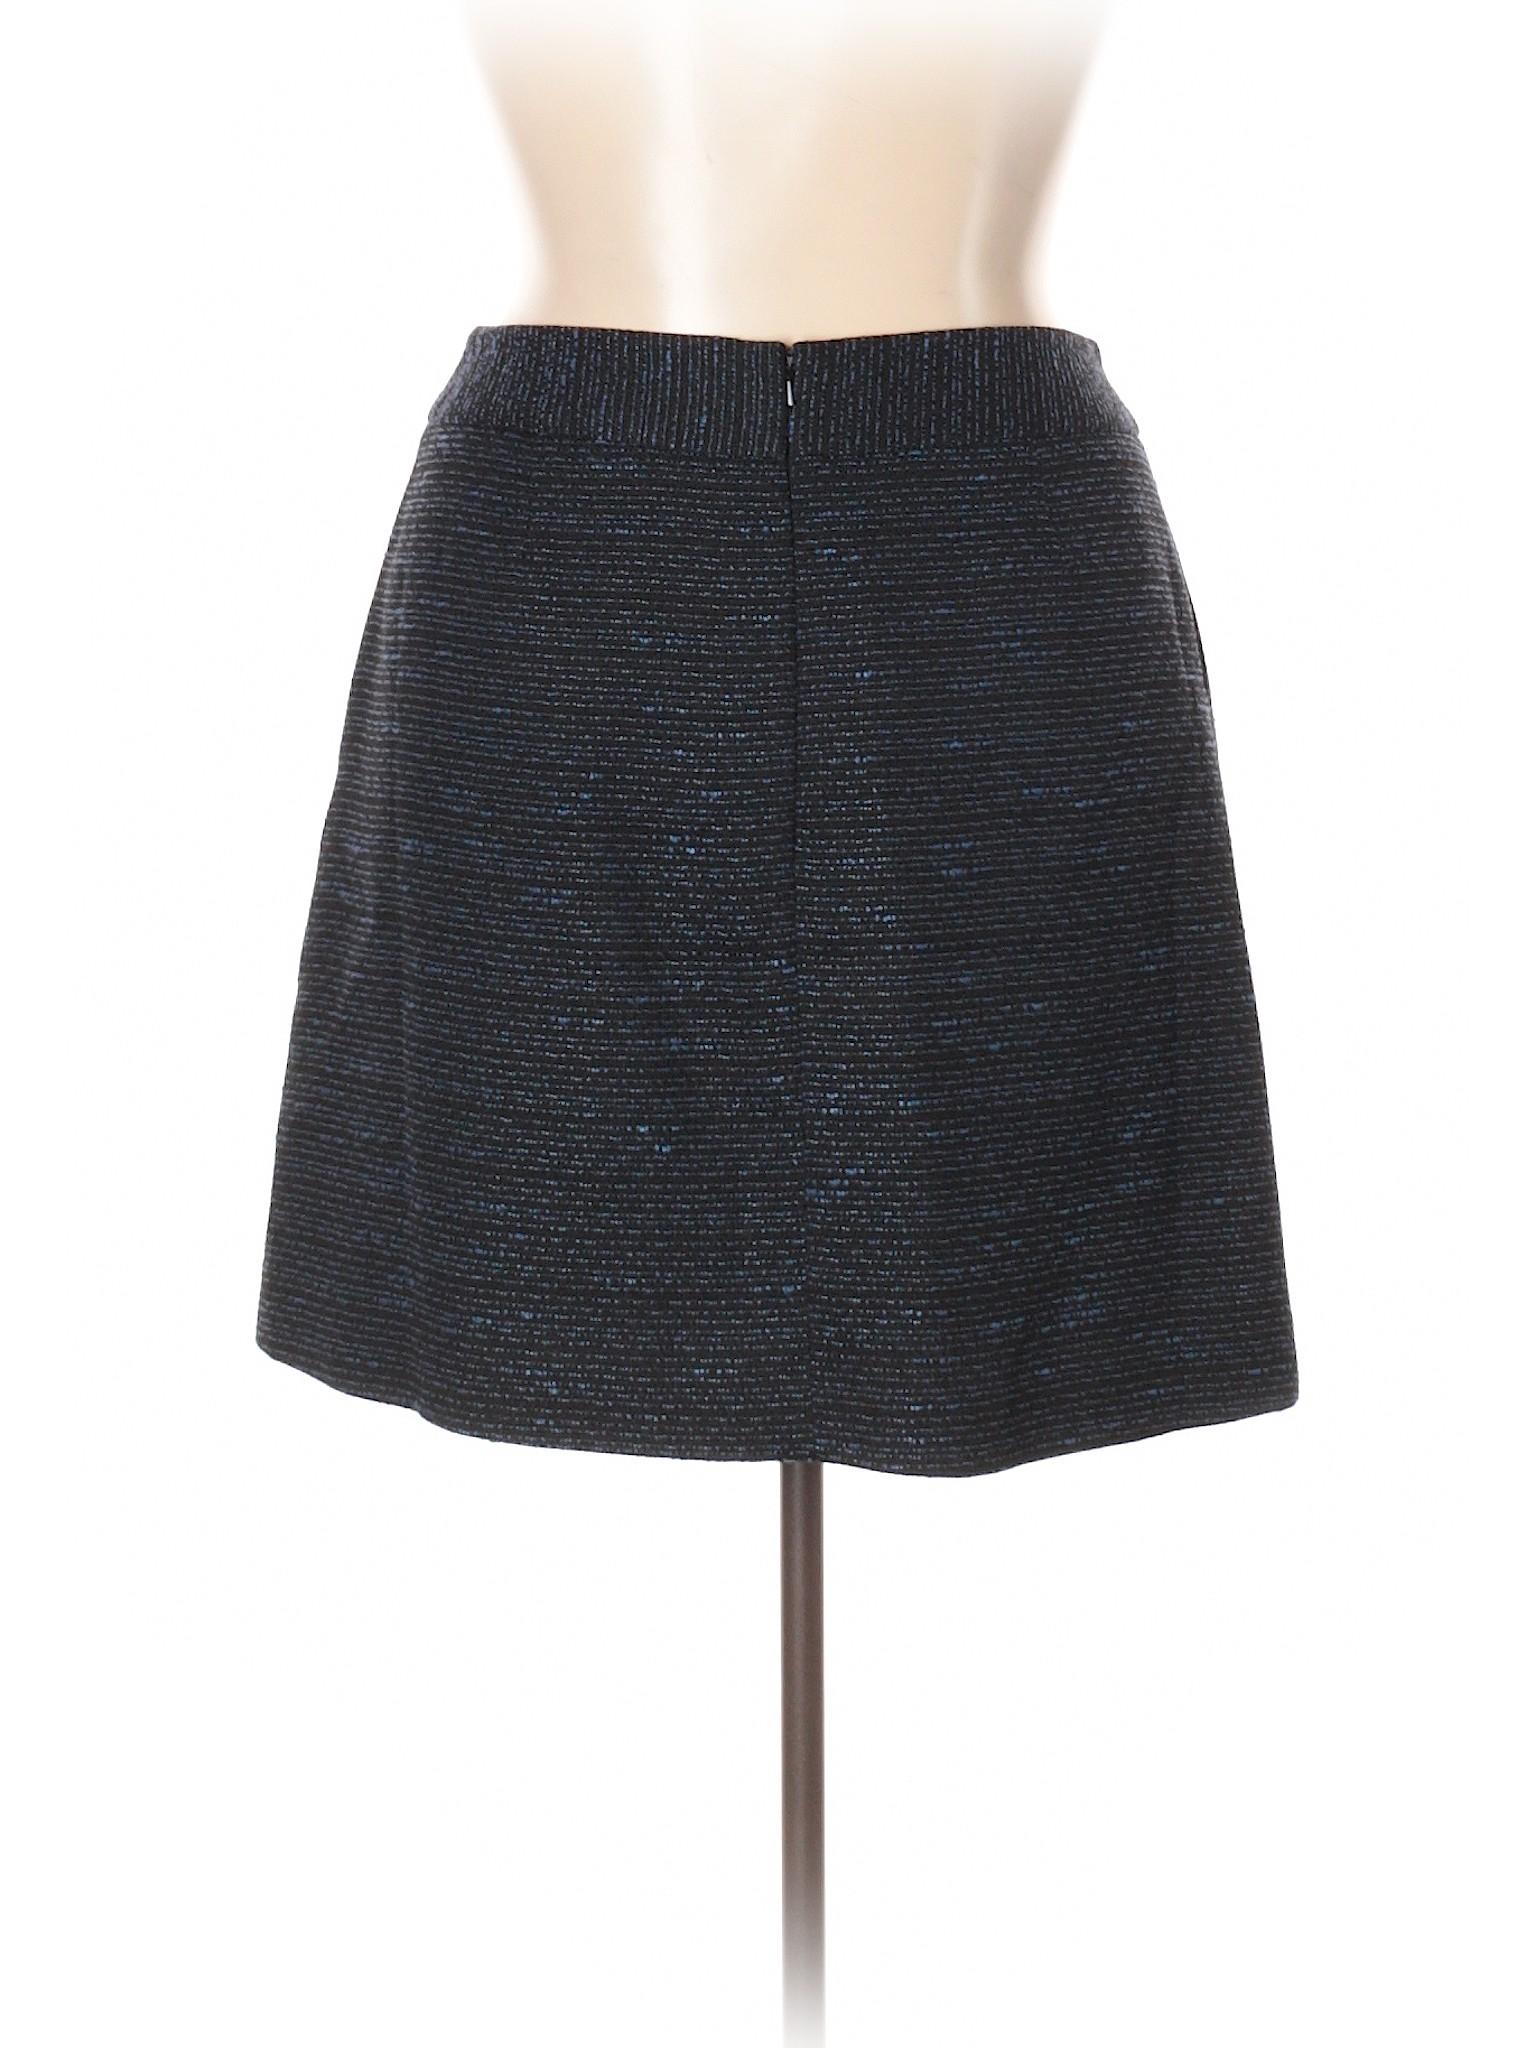 Boutique Boutique Boutique Casual Boutique Skirt Casual Boutique Skirt Casual Boutique Skirt Casual Casual Skirt Skirt Casual aYtwqO